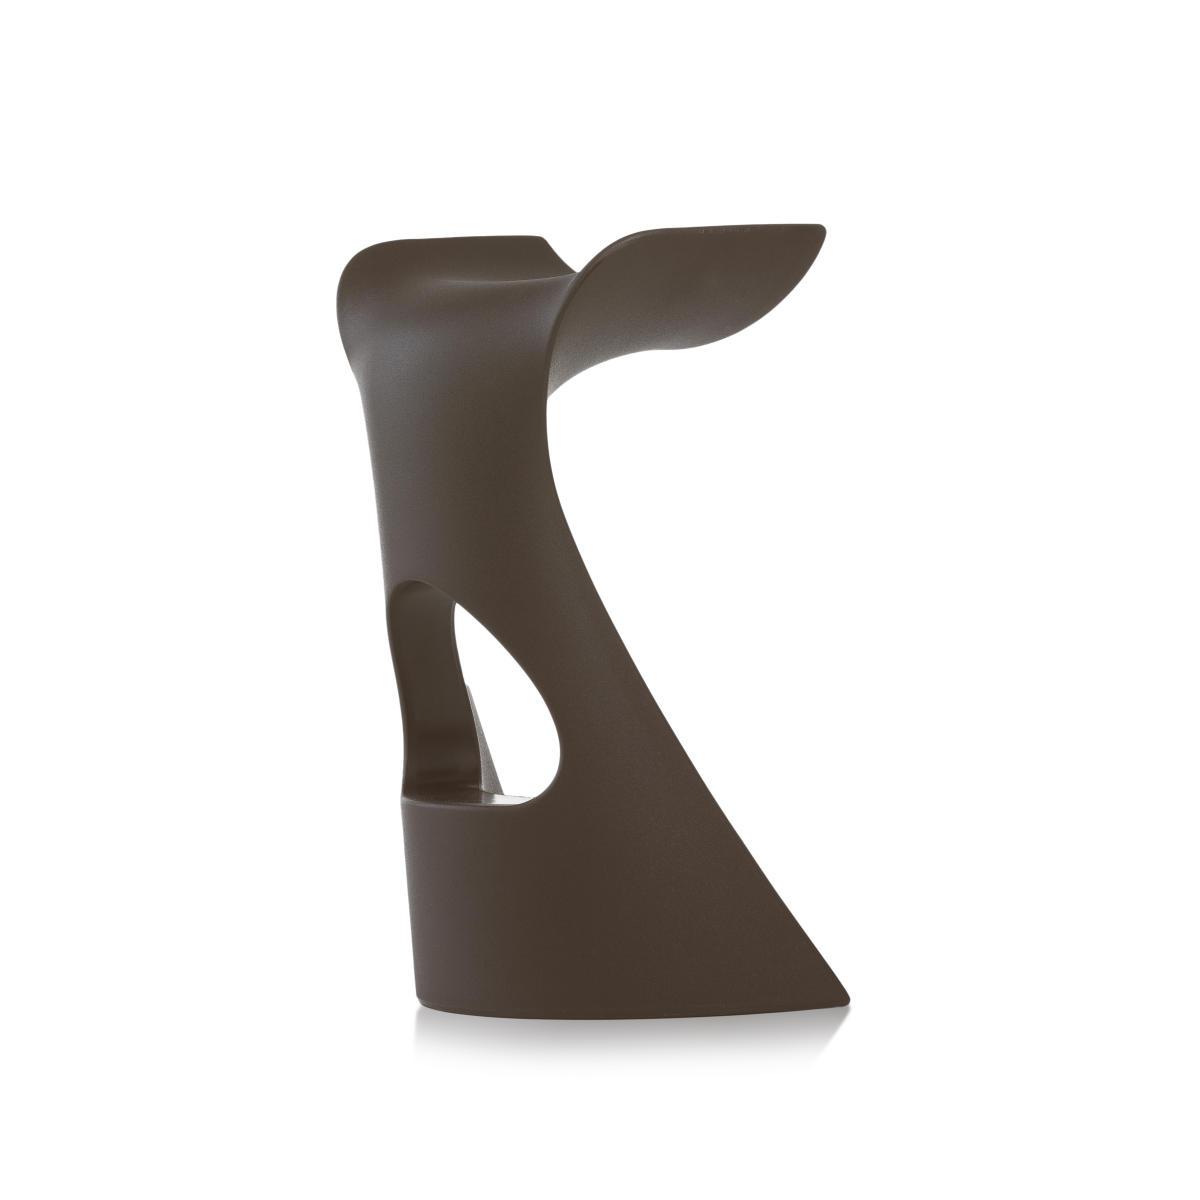 KONCORD Barhocker von Karim Rashid chocolate